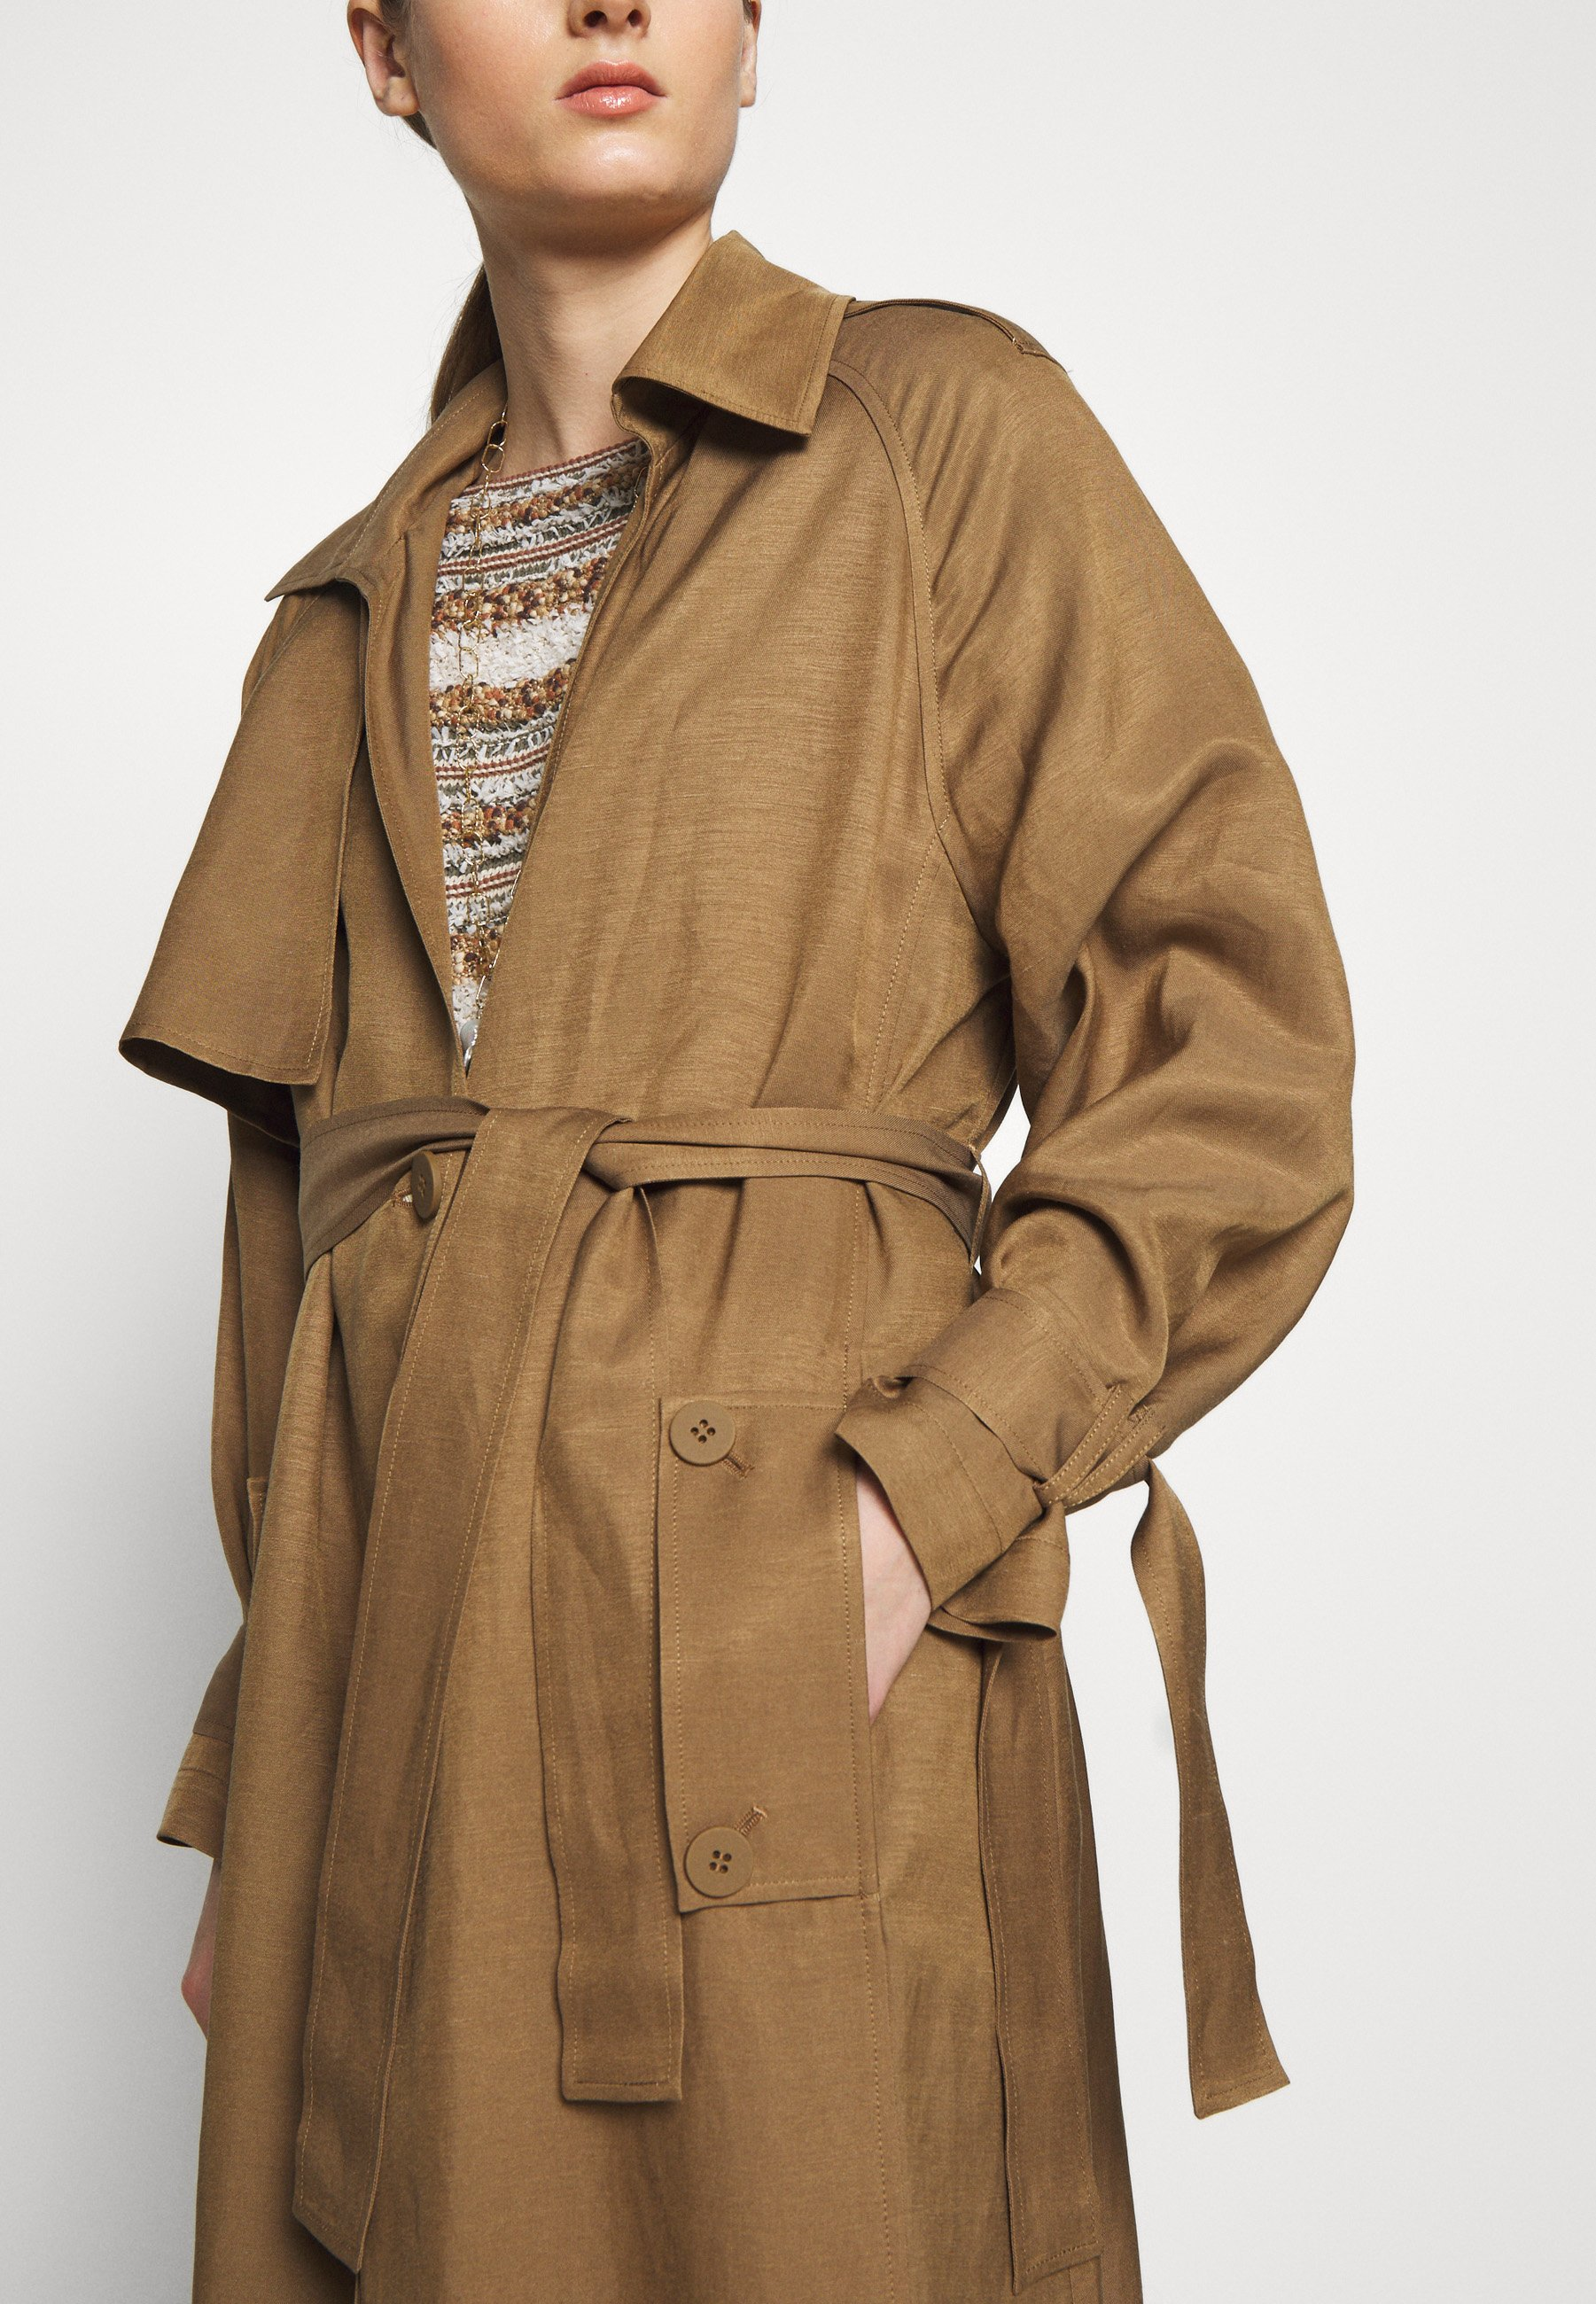 Max&co. Catalogo - Trenchcoat Brown UK